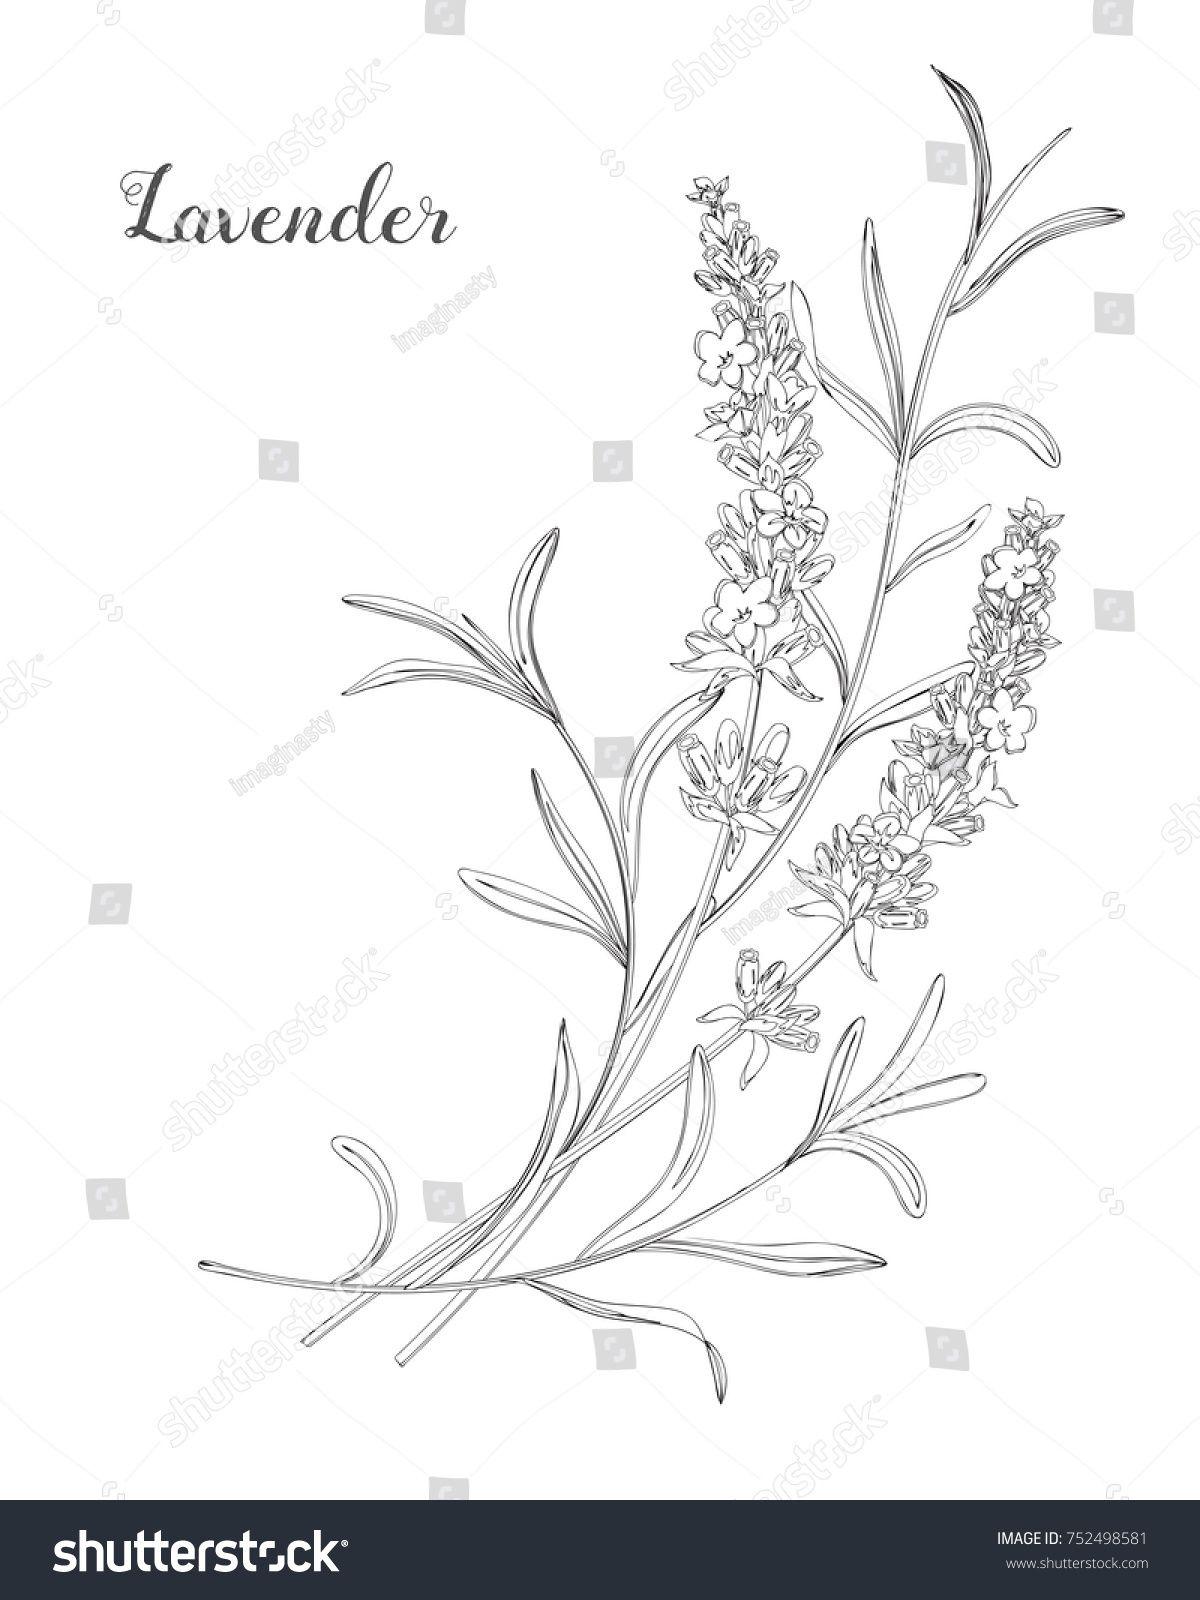 Vector Sketch Lavender Illustration Beautiful Boquet Of Lavender